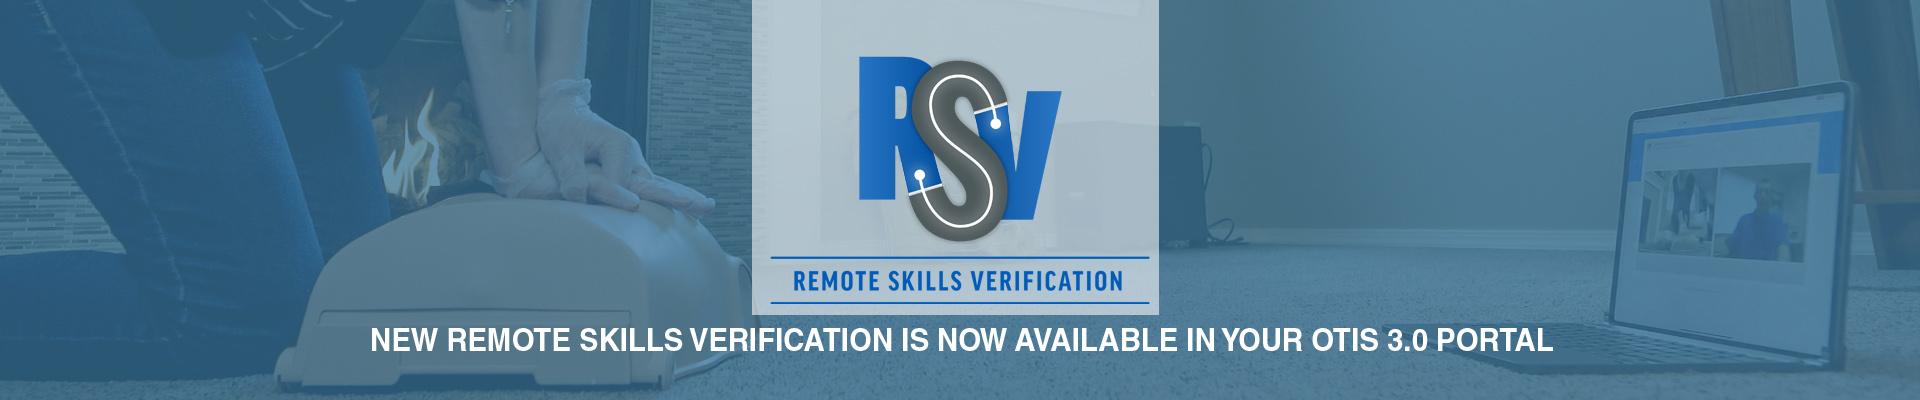 RSV web header 2